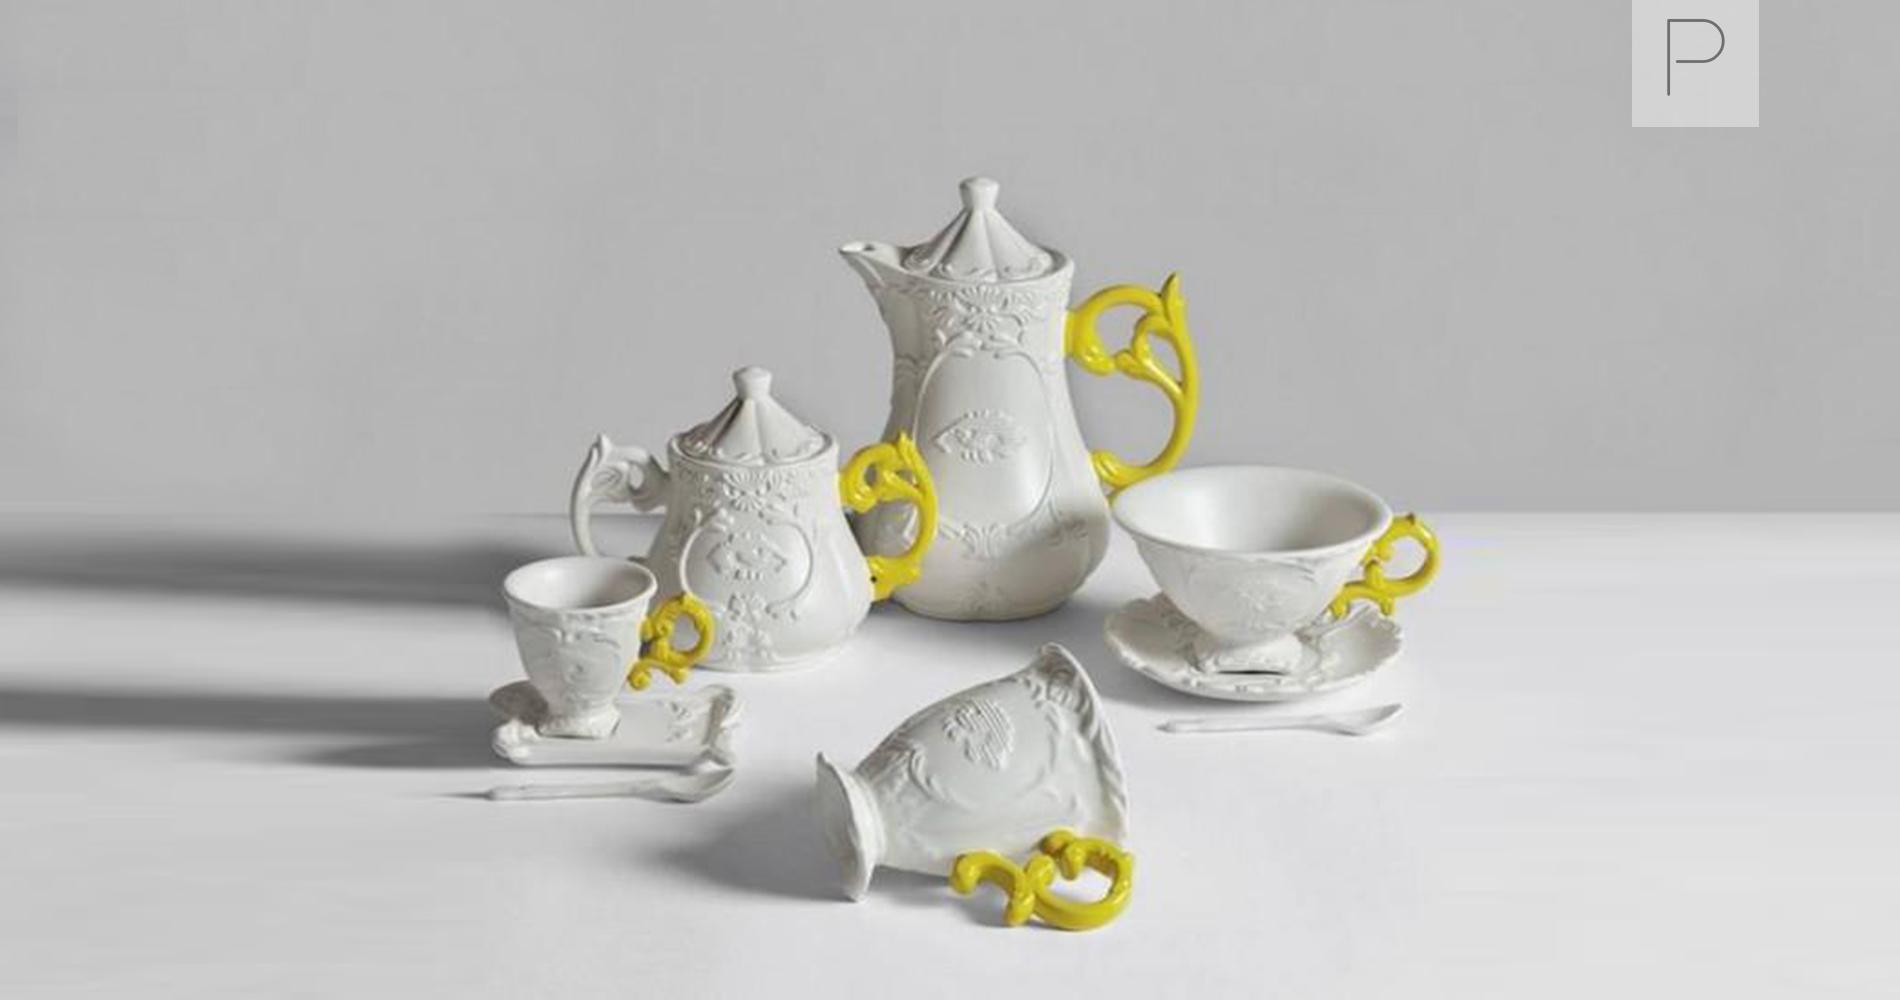 Yellow Seletti I-Ware Teacup Set